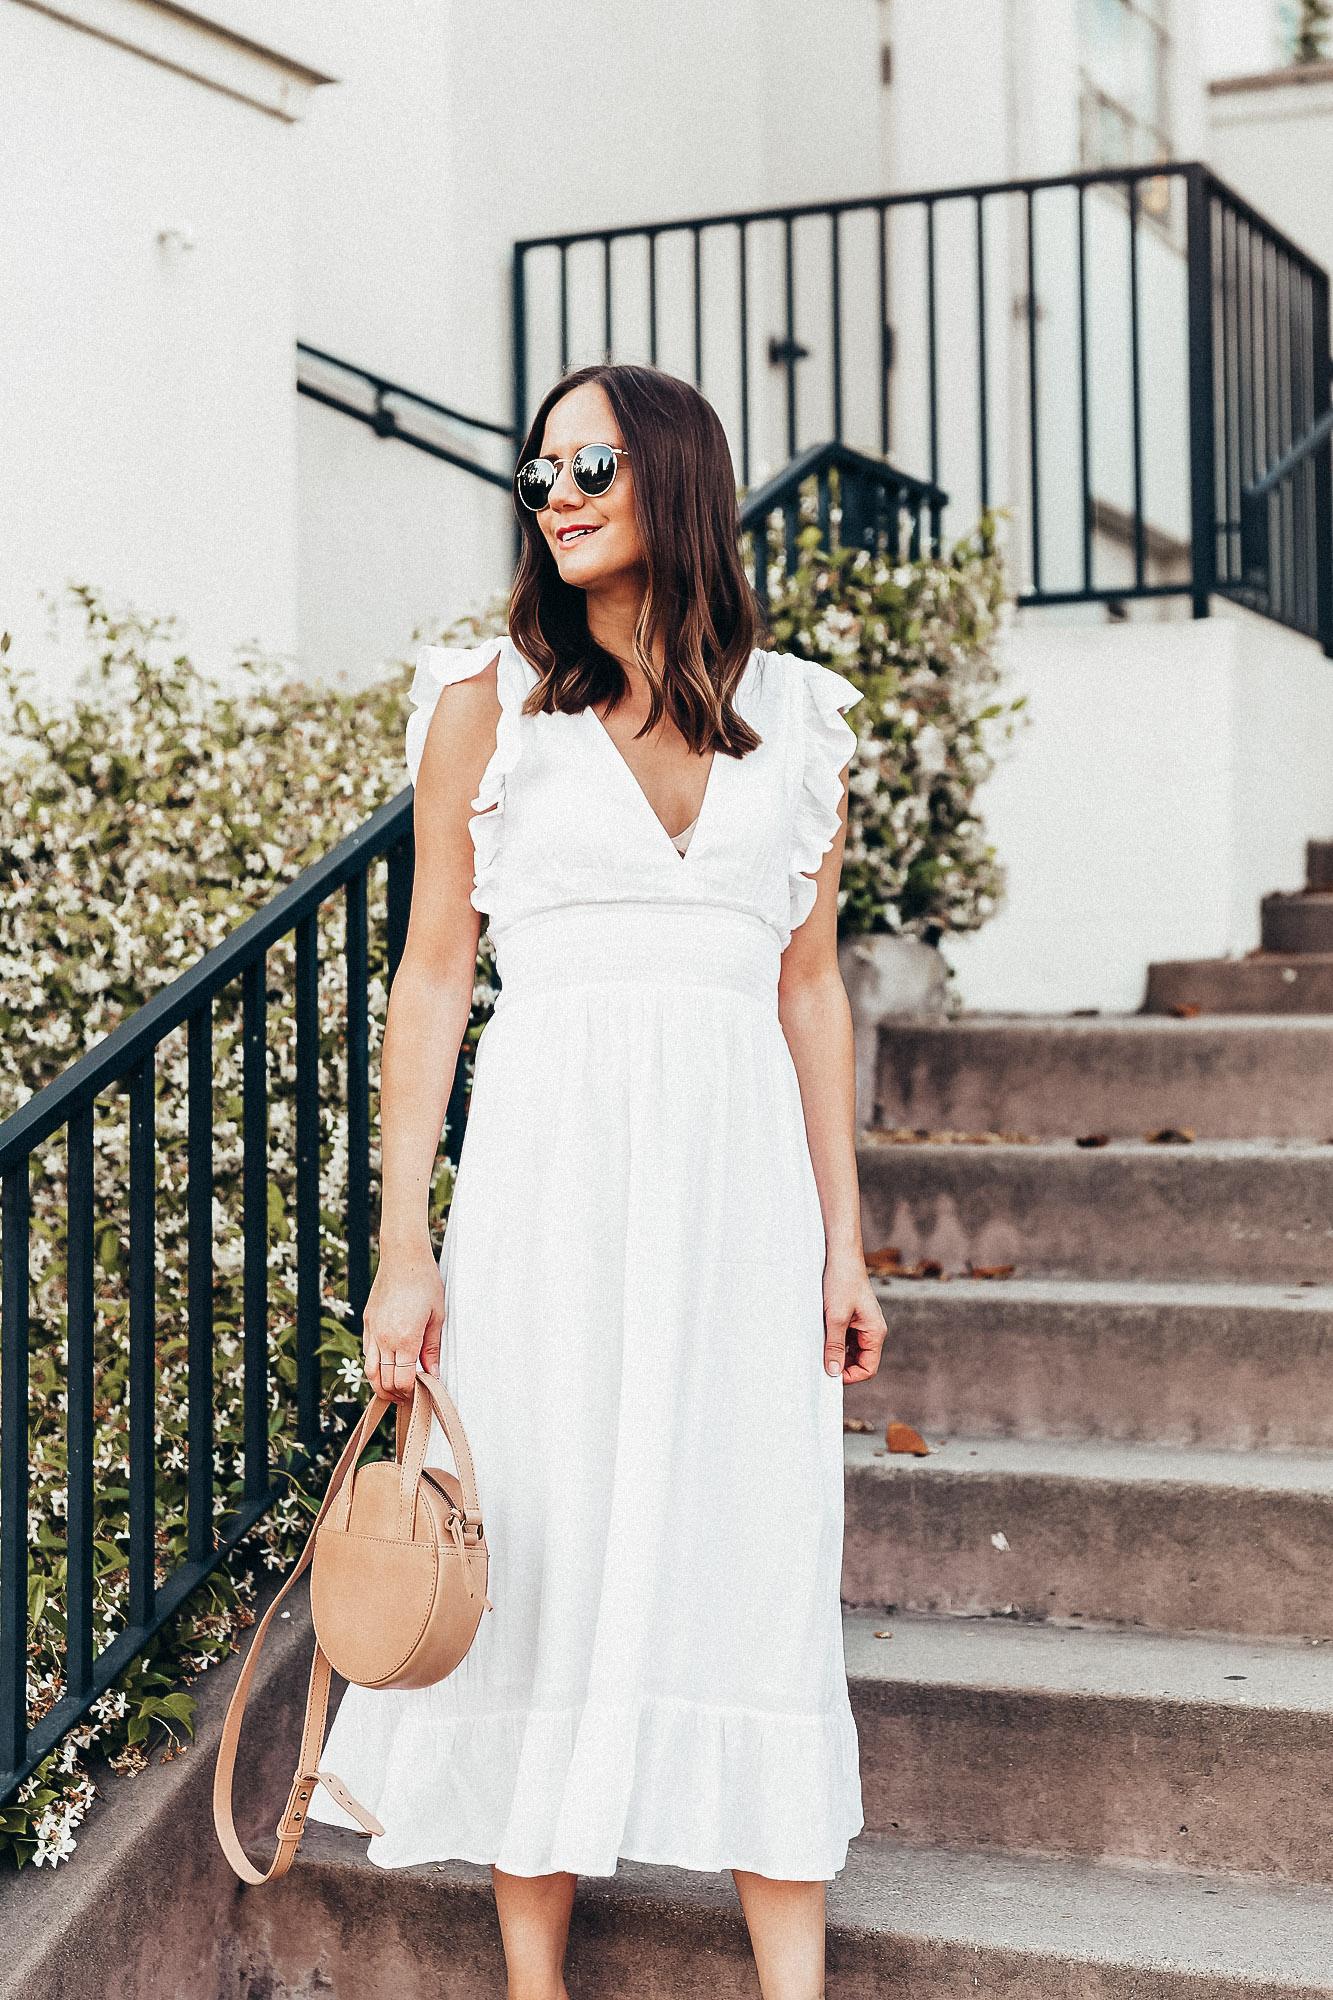 The Details: Nordstrom Dress  |  Bella Vita Sandals  |  Madewell Bag  |  Ray-Ban Sunglasses |  Madewell Pavé Circle Ring